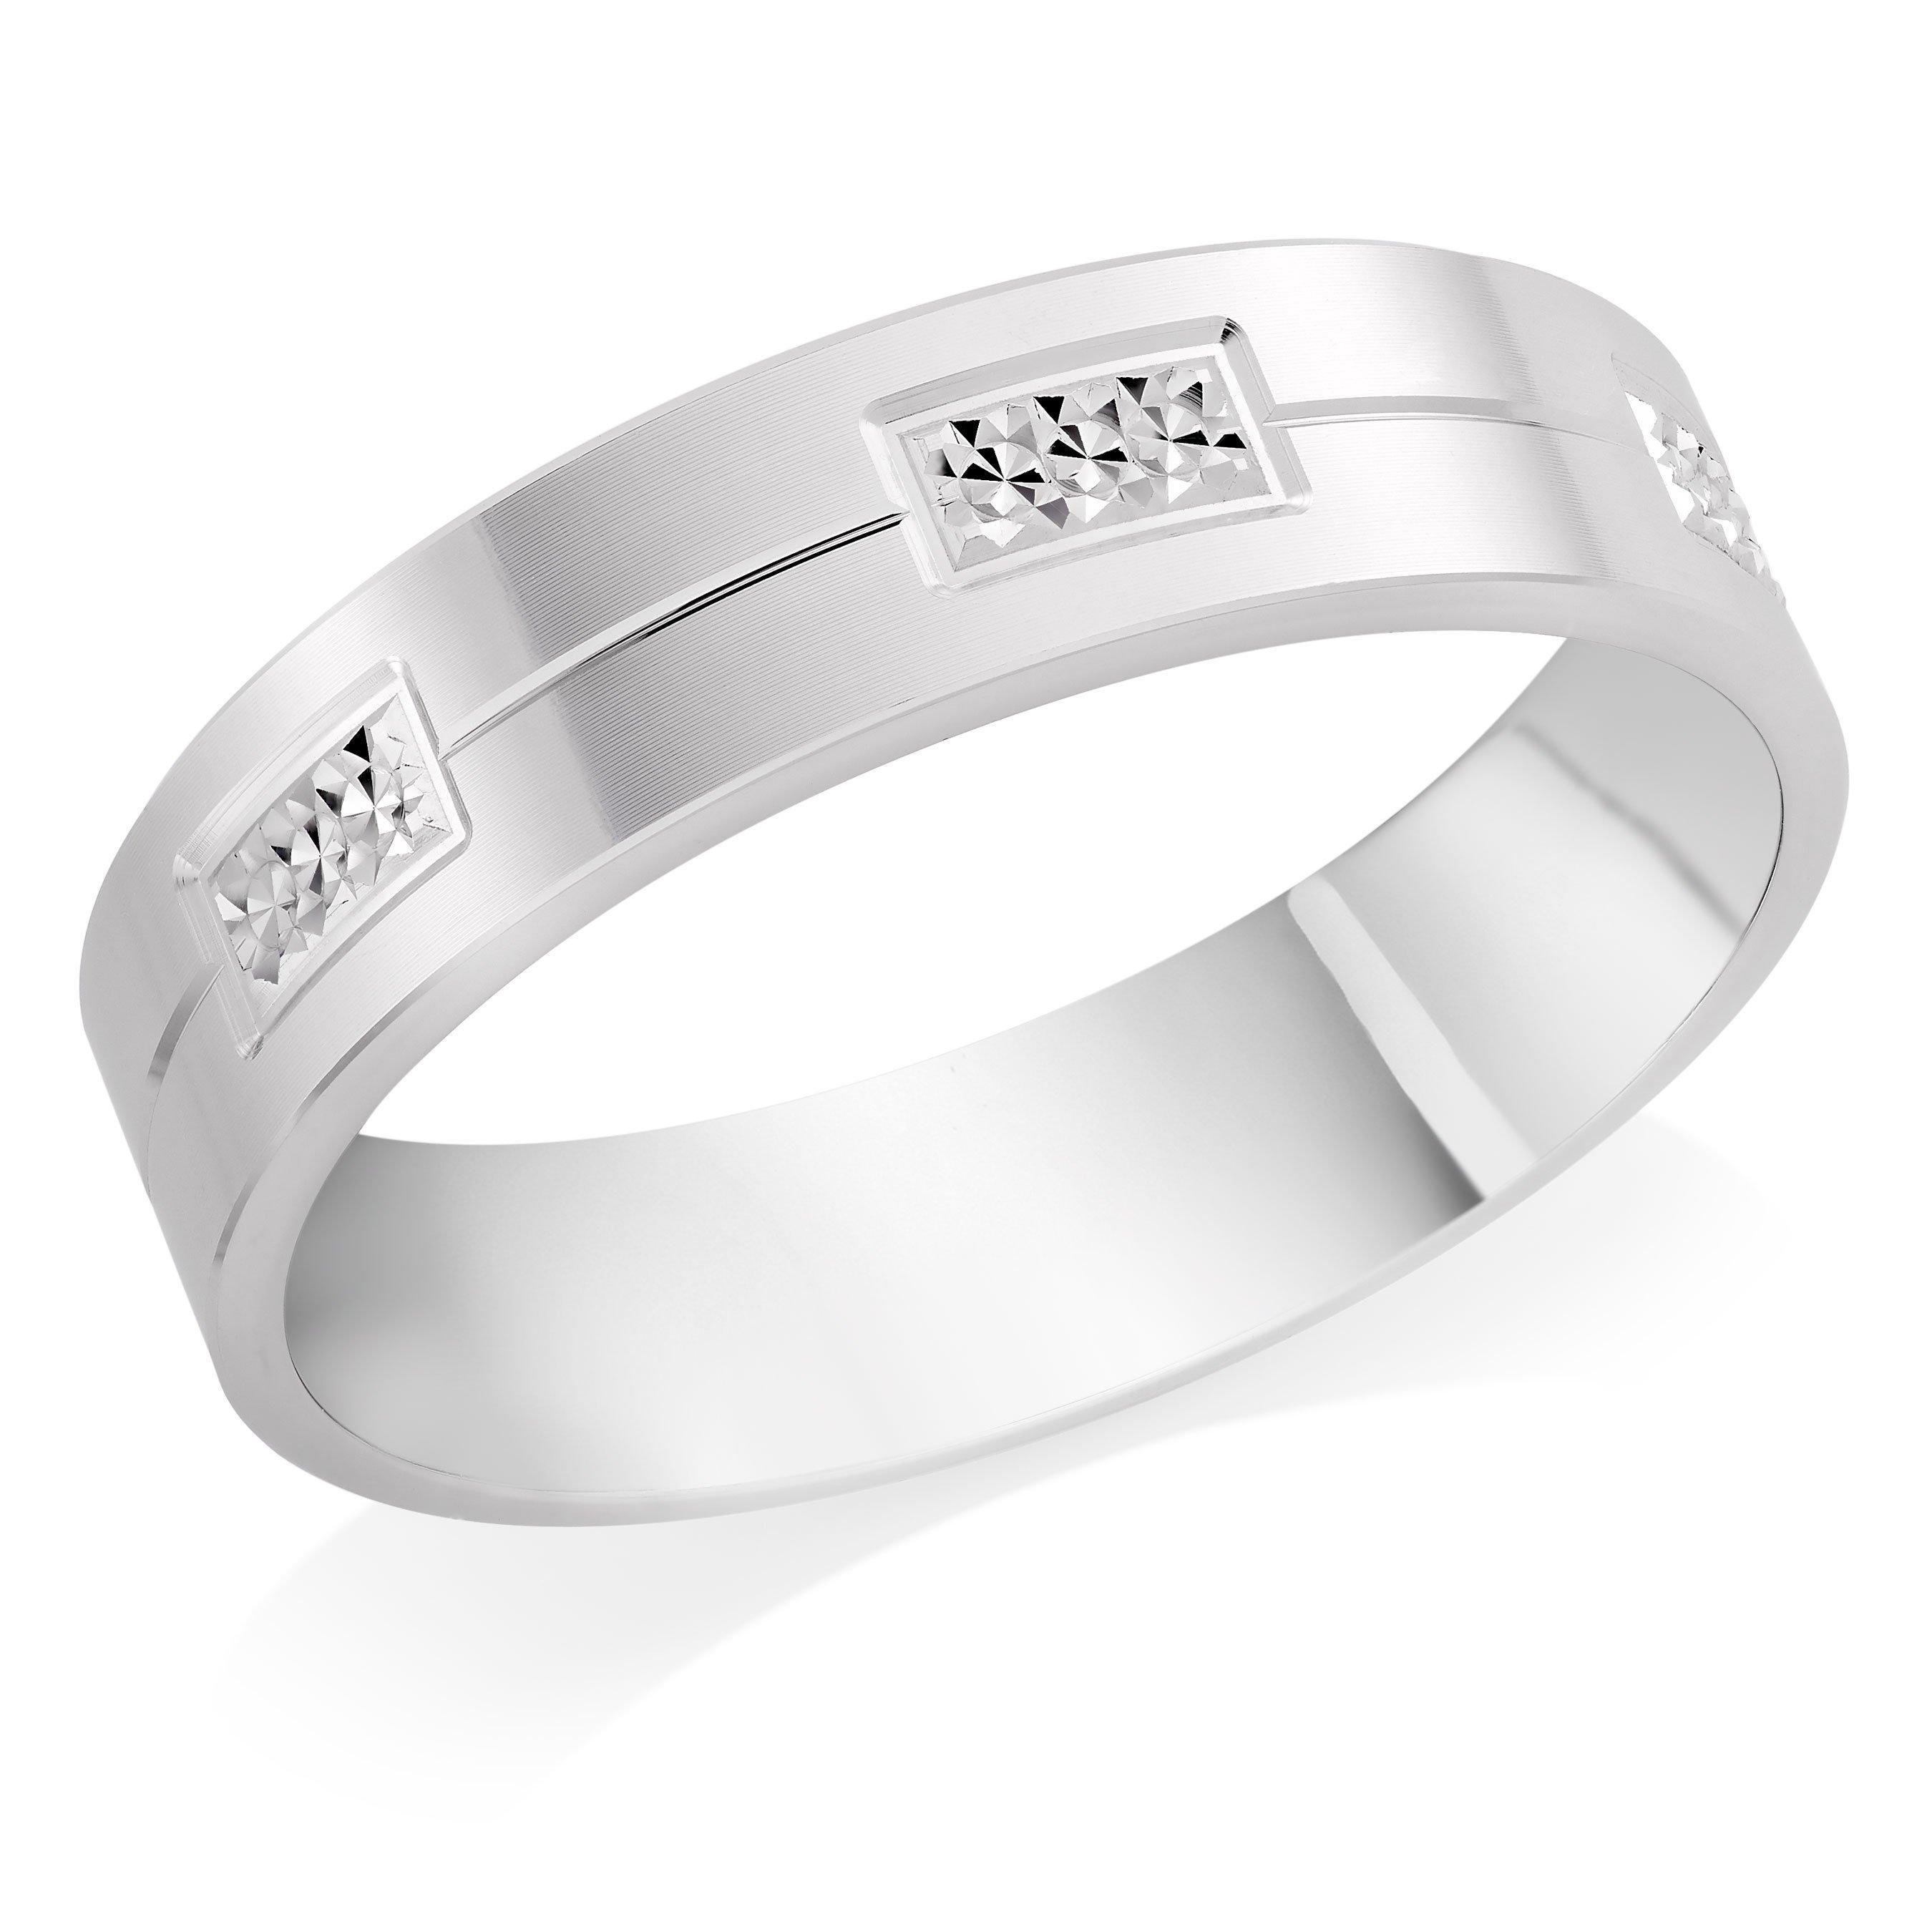 9ct White Gold Sparkle Cut Men's Wedding Ring